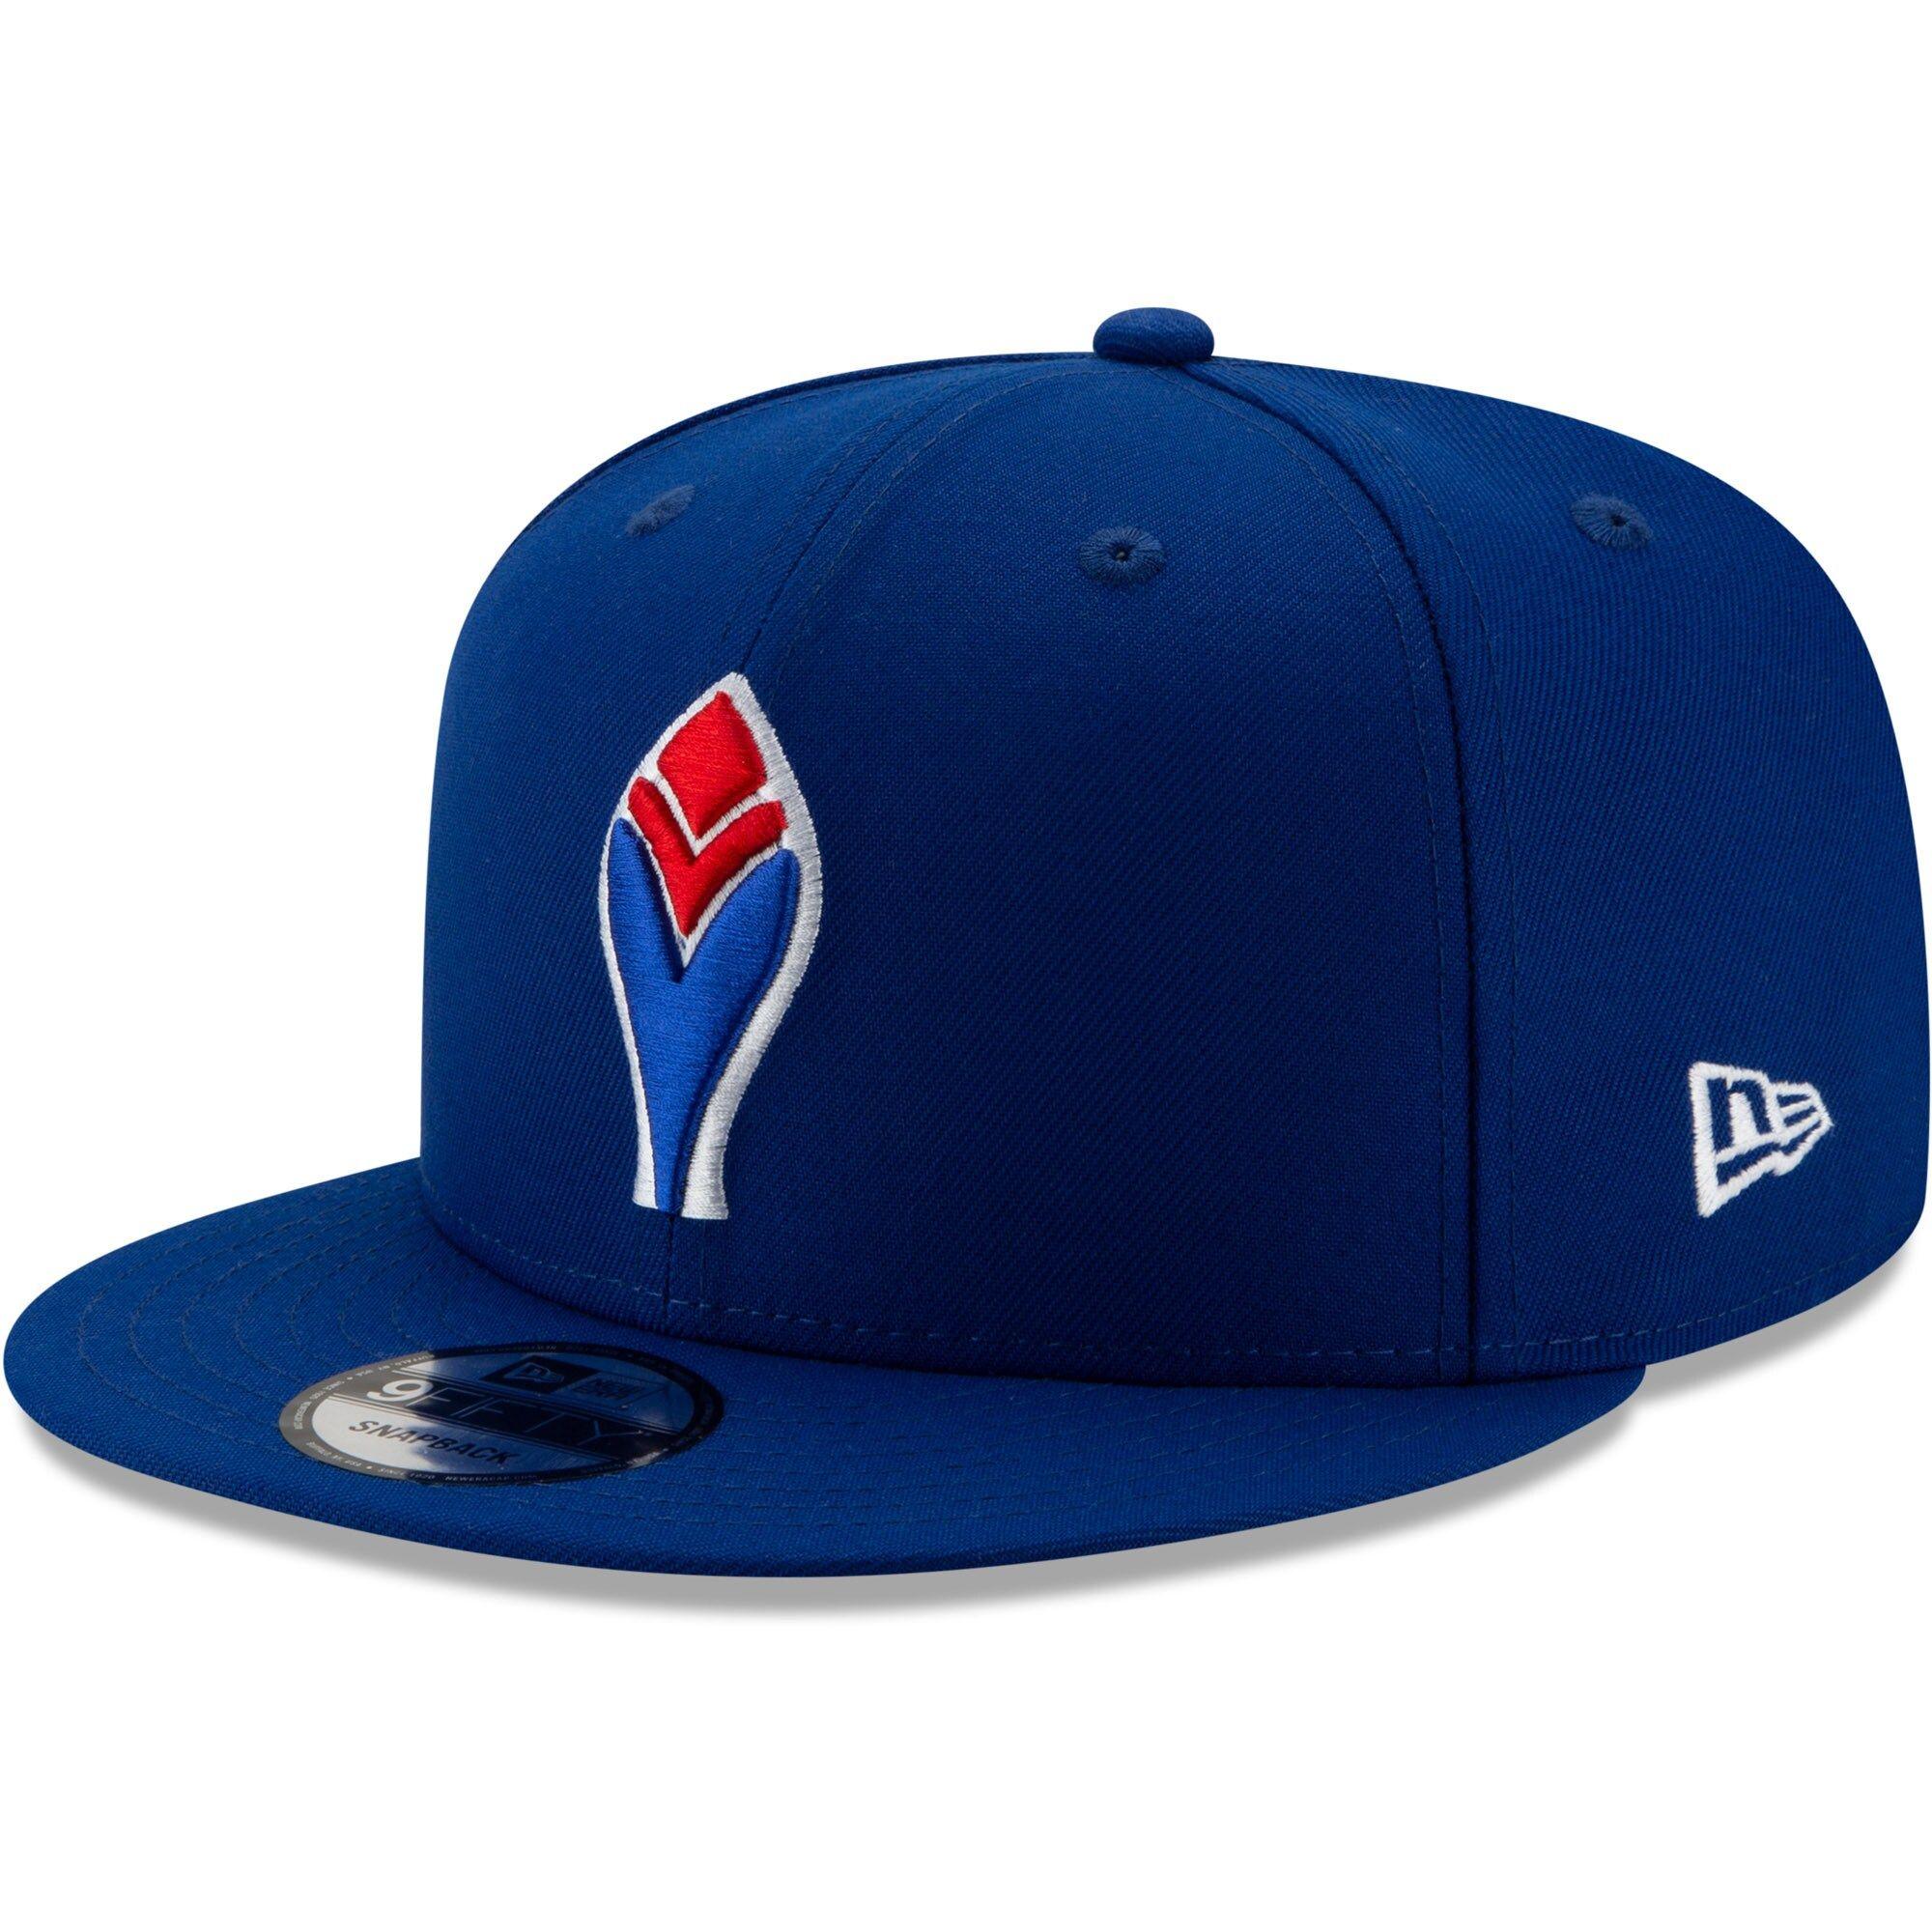 Pin On Caps Trucker Caps Hats